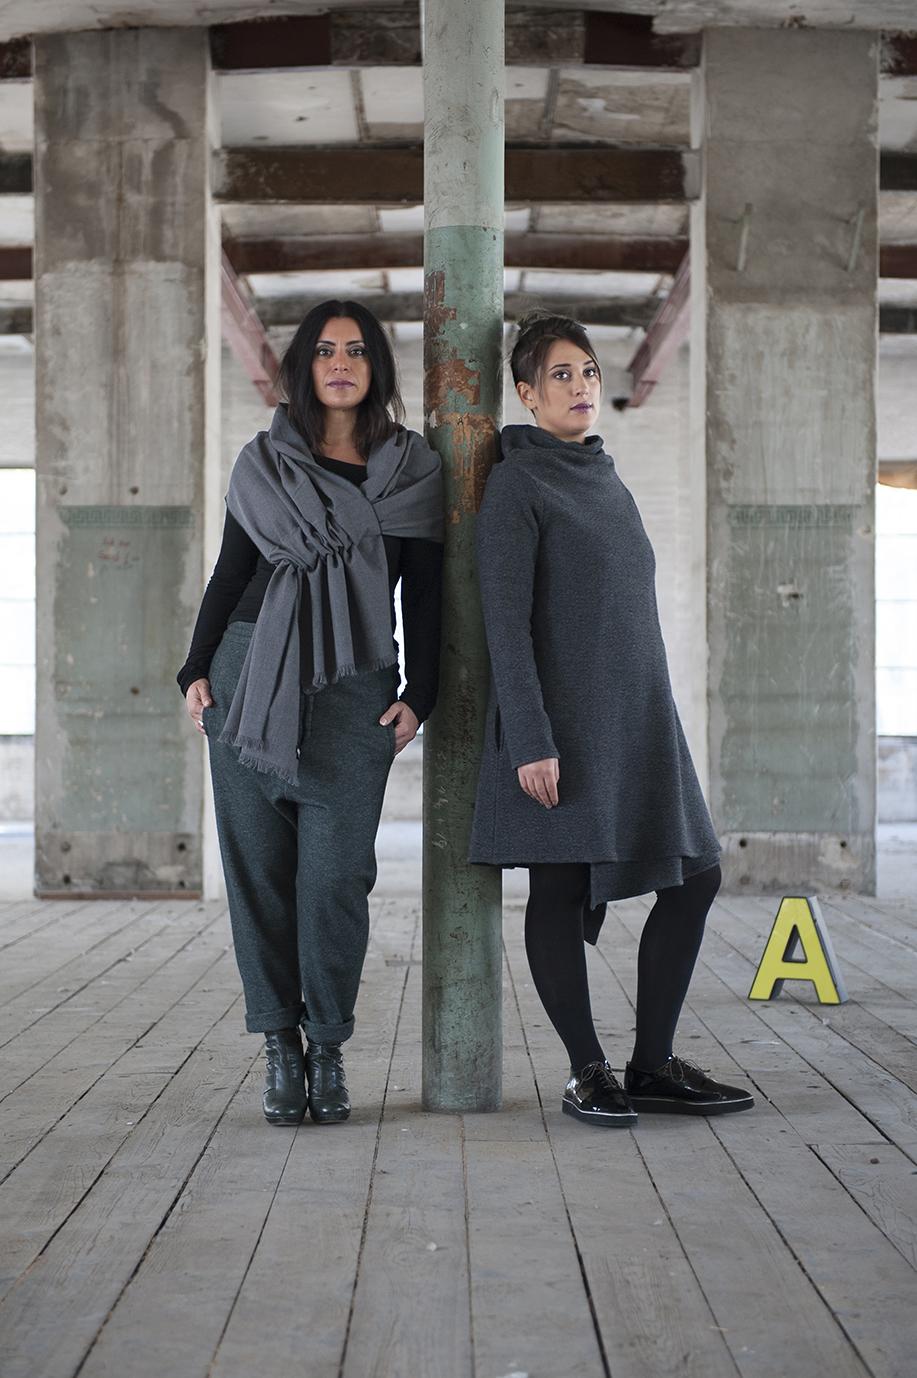 NANU, Herbstkollektion 2015, design by Sandra Strasser, Swiss made, Hair & Make-Up Sara Urso, Photo by Aissa Tripodi